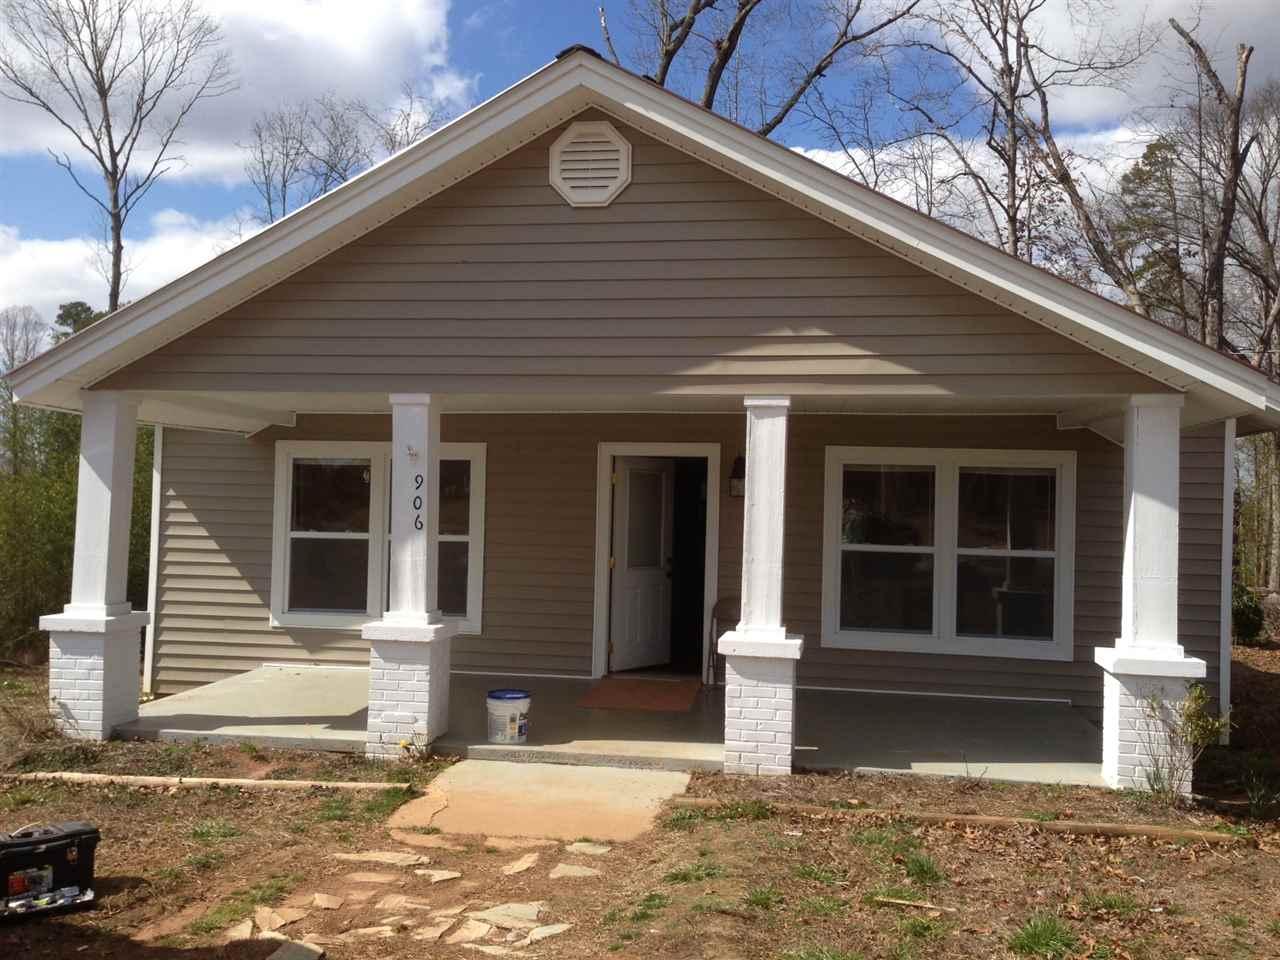 Rental Homes for Rent, ListingId:33045195, location: 906 W South 4th Street Seneca 29678